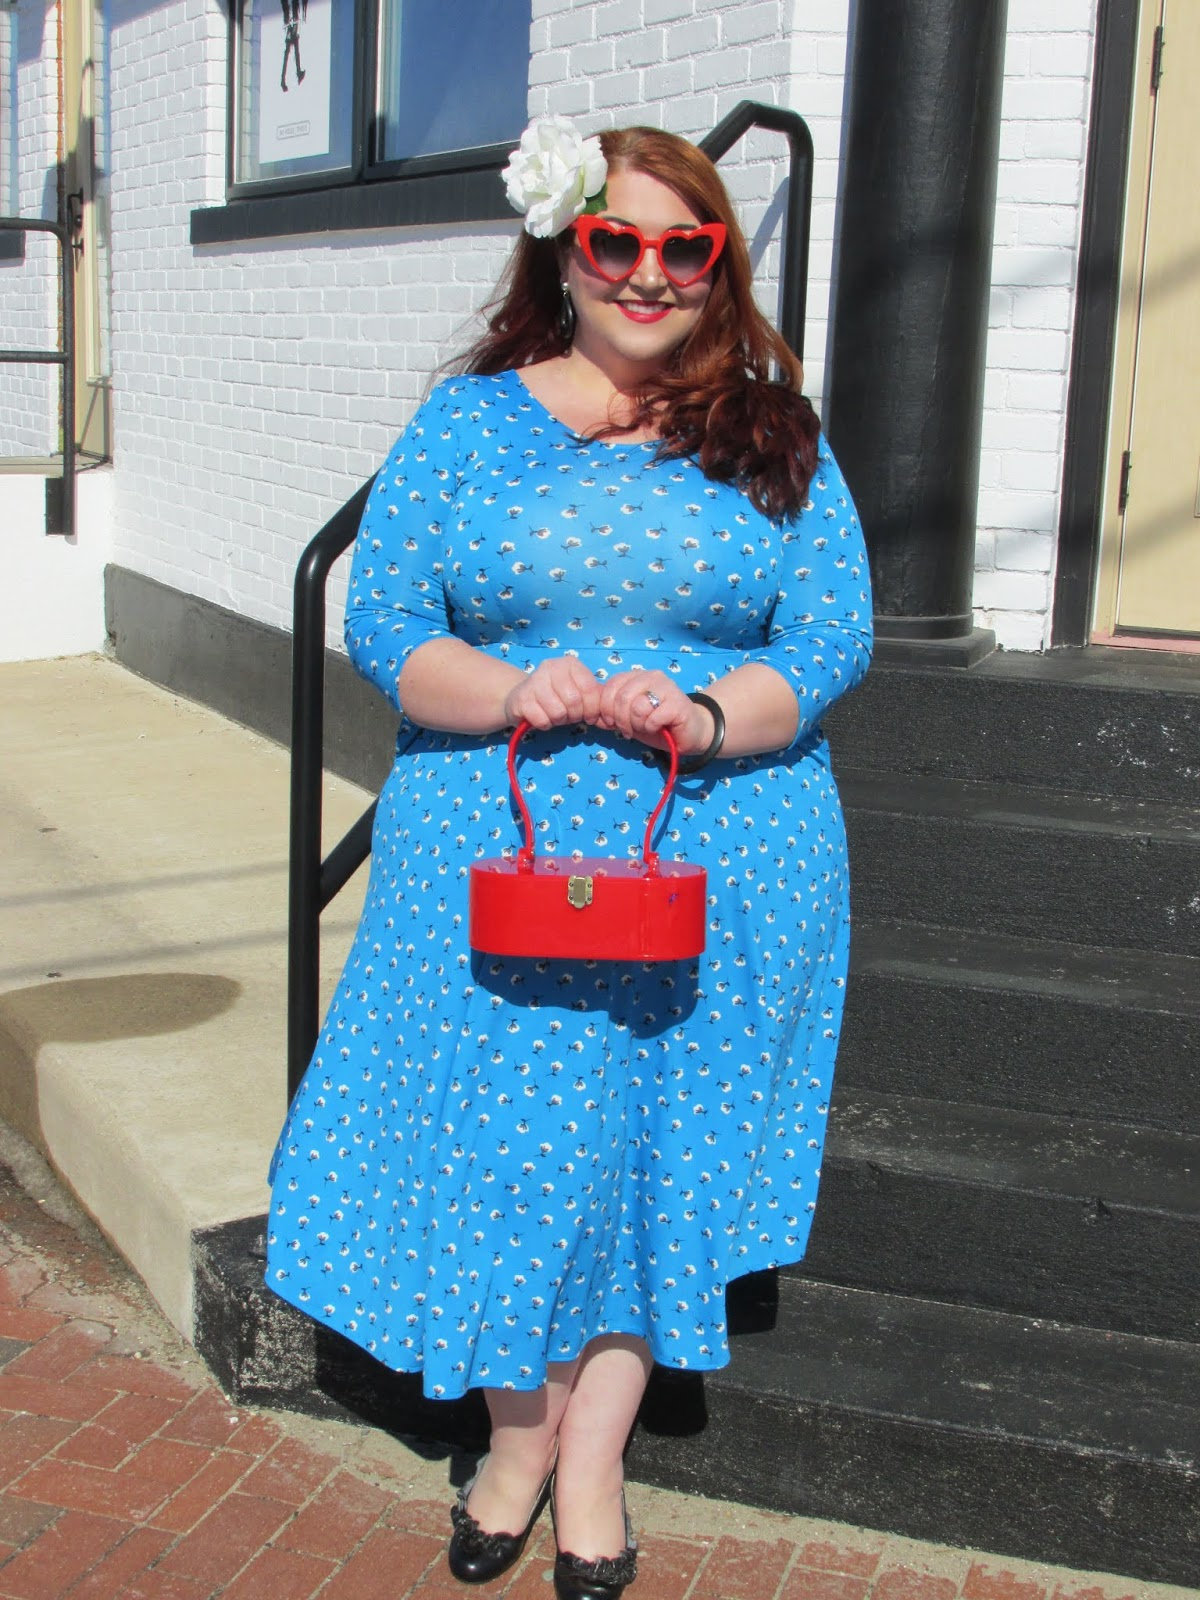 583e2709d2 Dress  Maria Dress in Poolside Print